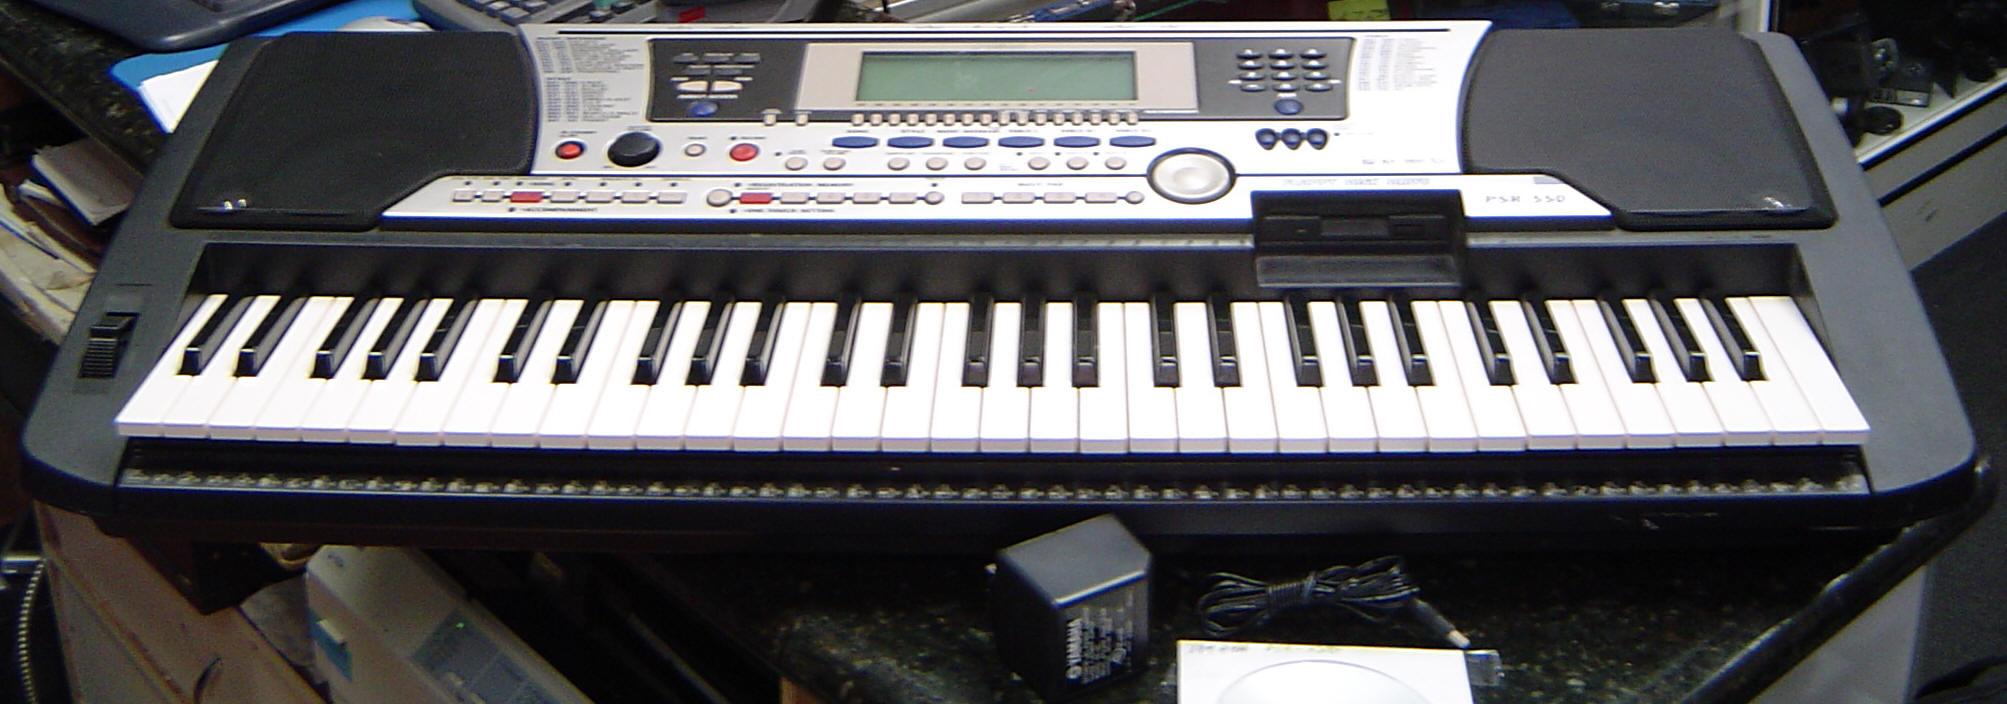 yamaha psr 550 keyboard 61 piano size touch sensitive keys rh pawnplex com manual yamaha psr s550 manual do teclado yamaha psr 550 em portugues